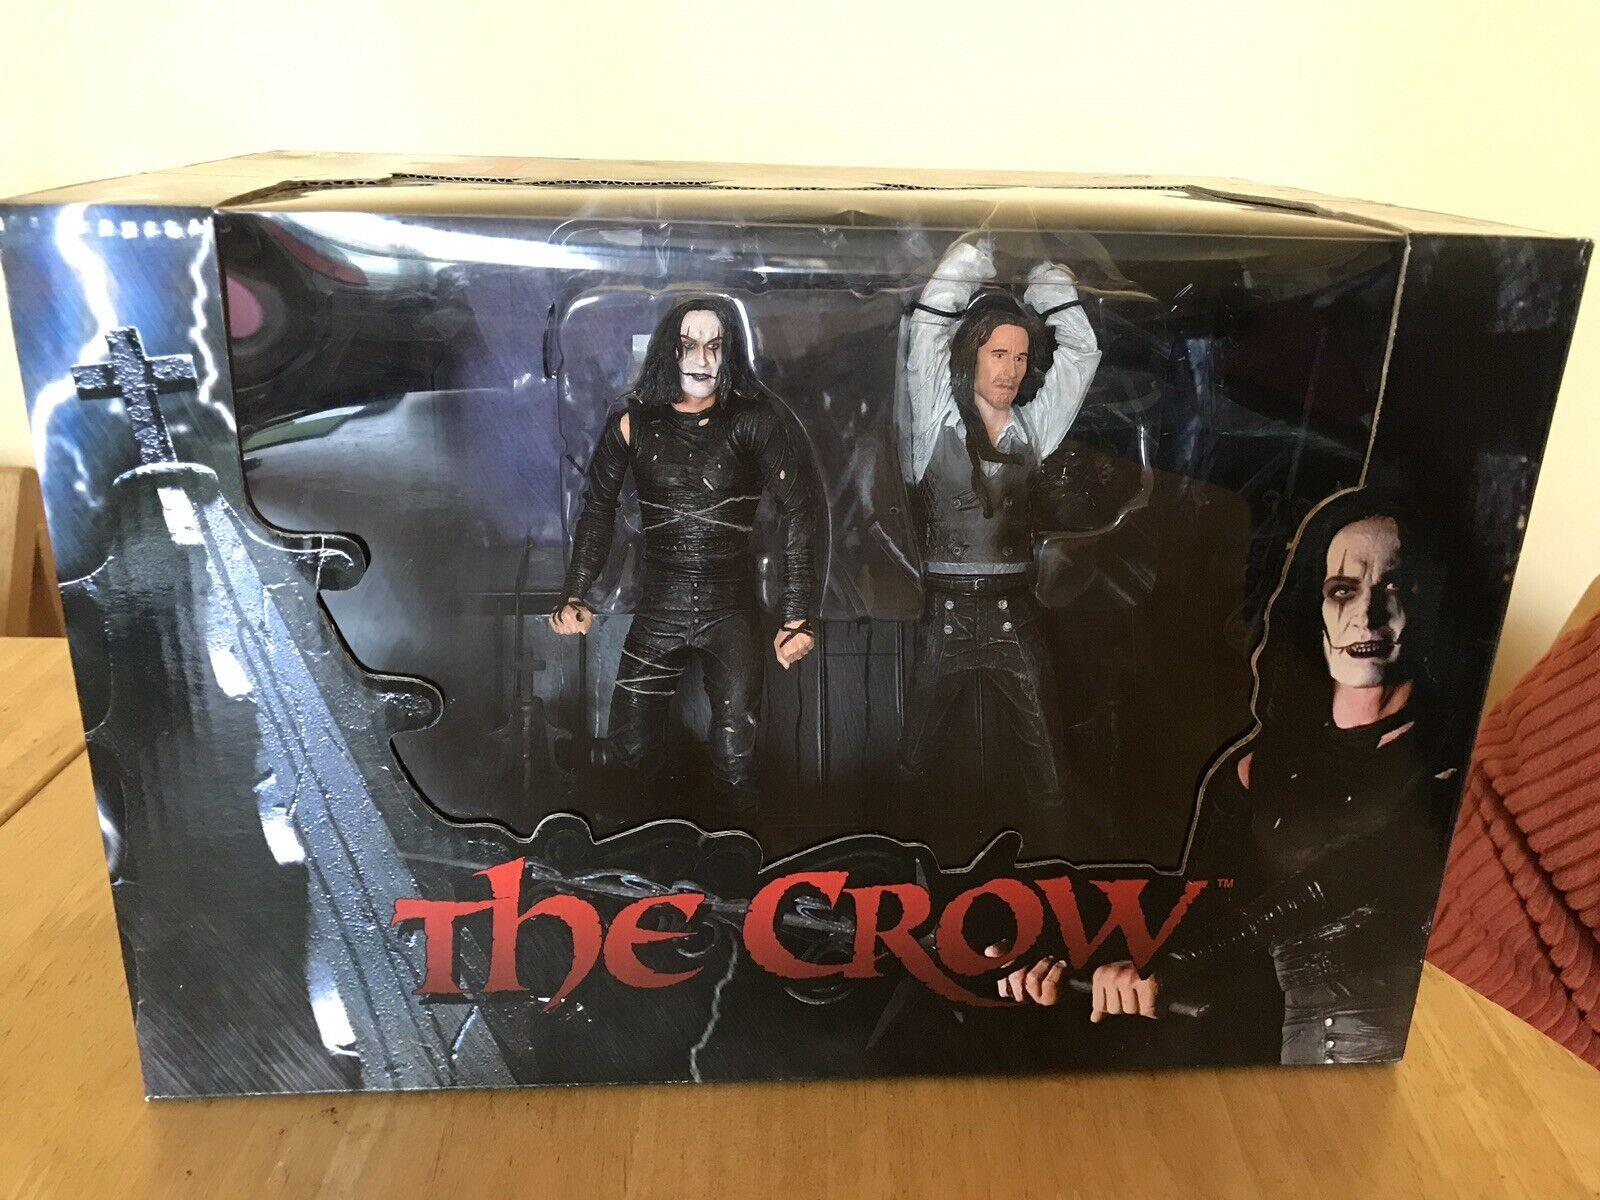 NECA NECA NECA The Crow  - Deluxe 2-Figure Diorama Boxset UNOPENED 4c132a